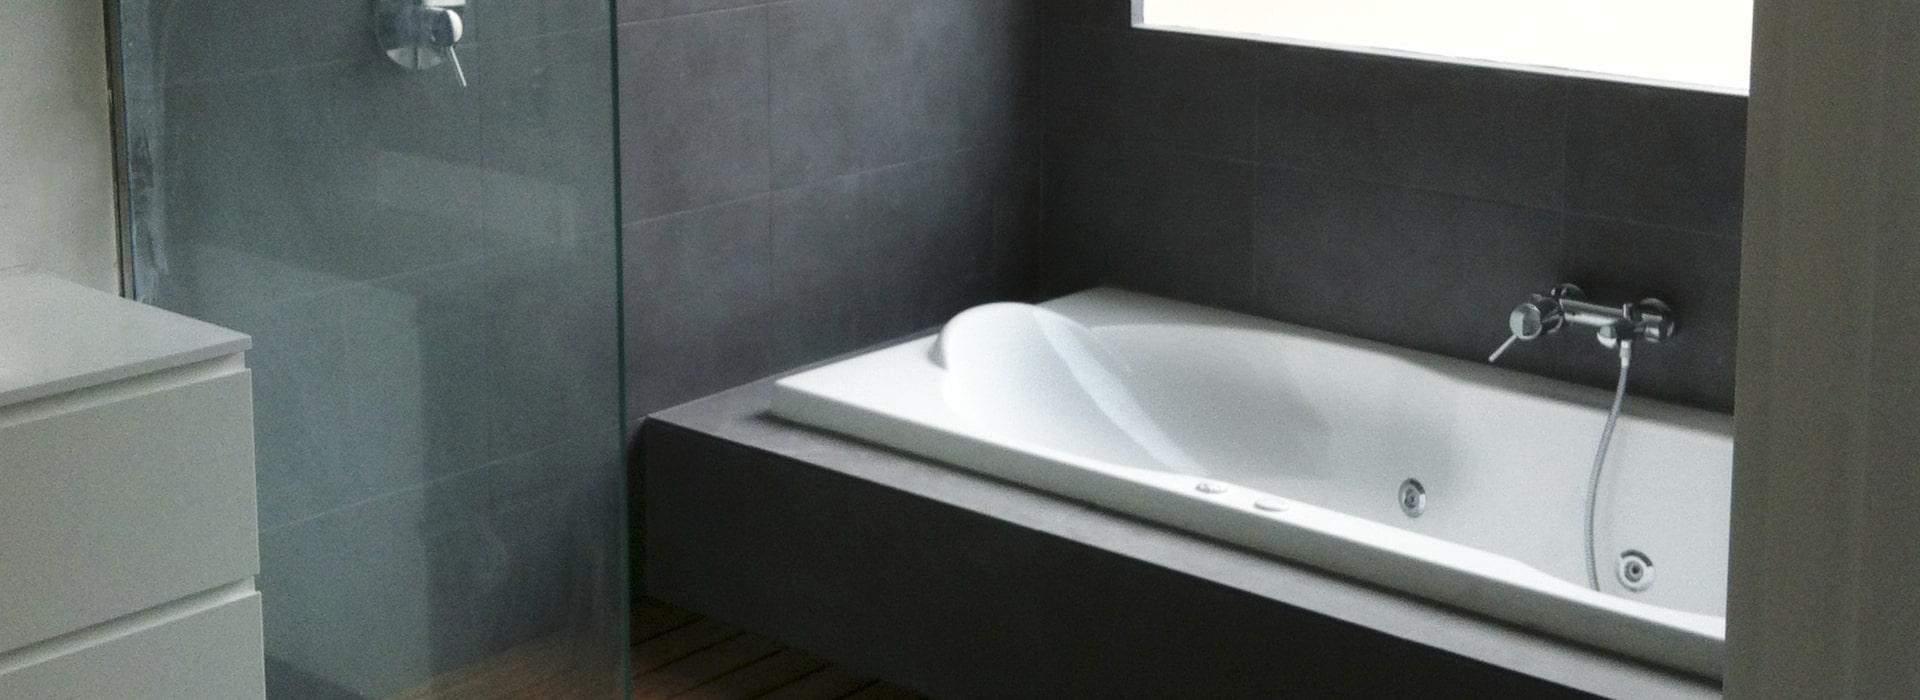 reforma baño muval